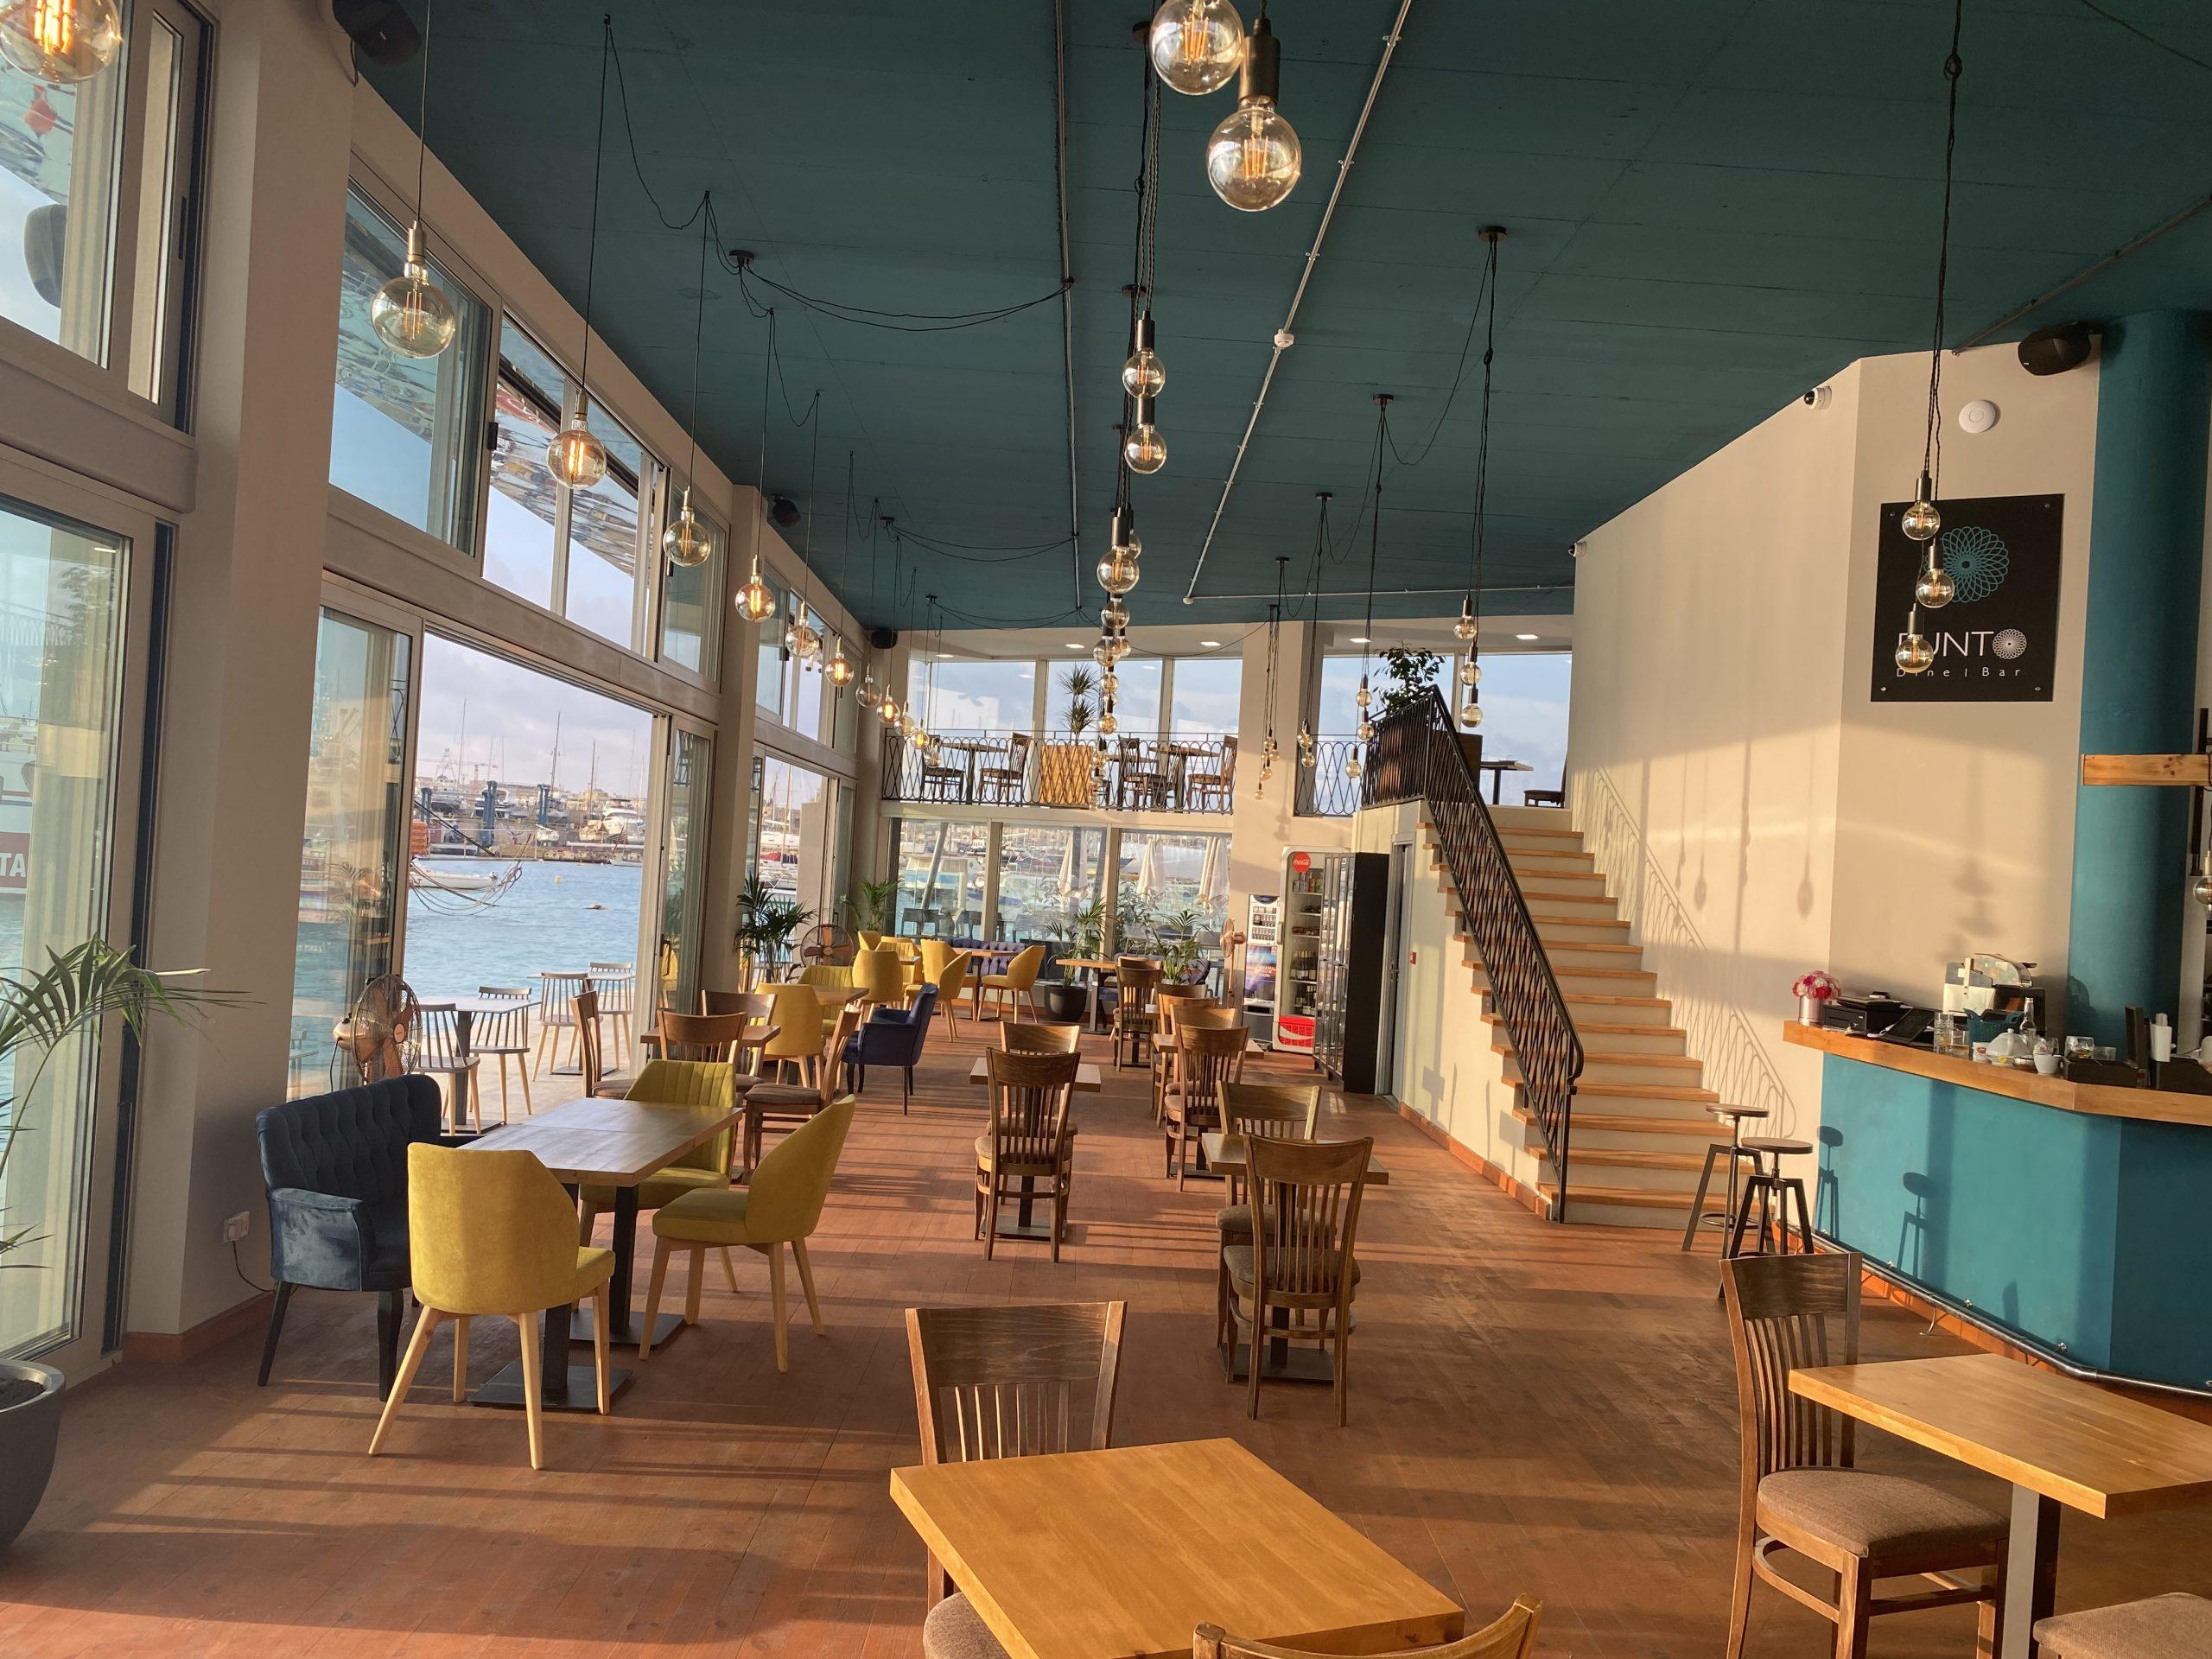 Punto Bar & Dine in Sliema, Malta